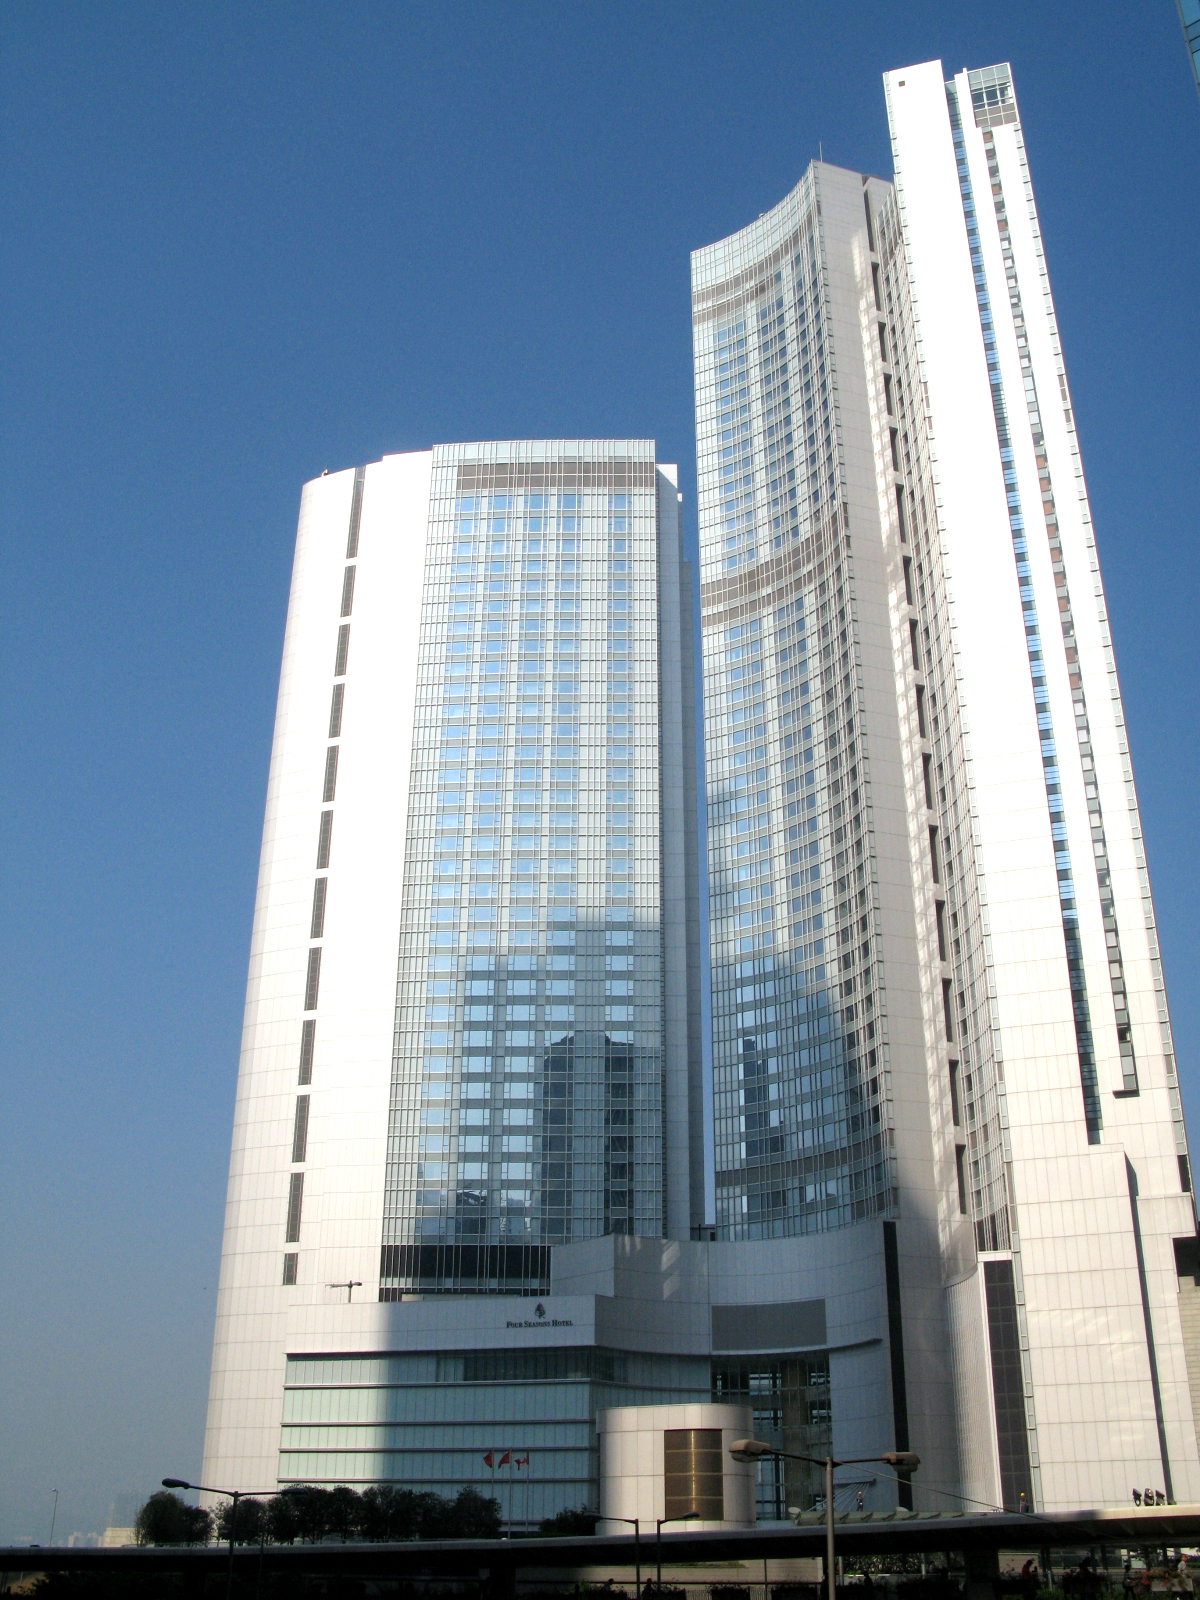 List of Best hotel(s) in Hong Kong - SkyscraperCity